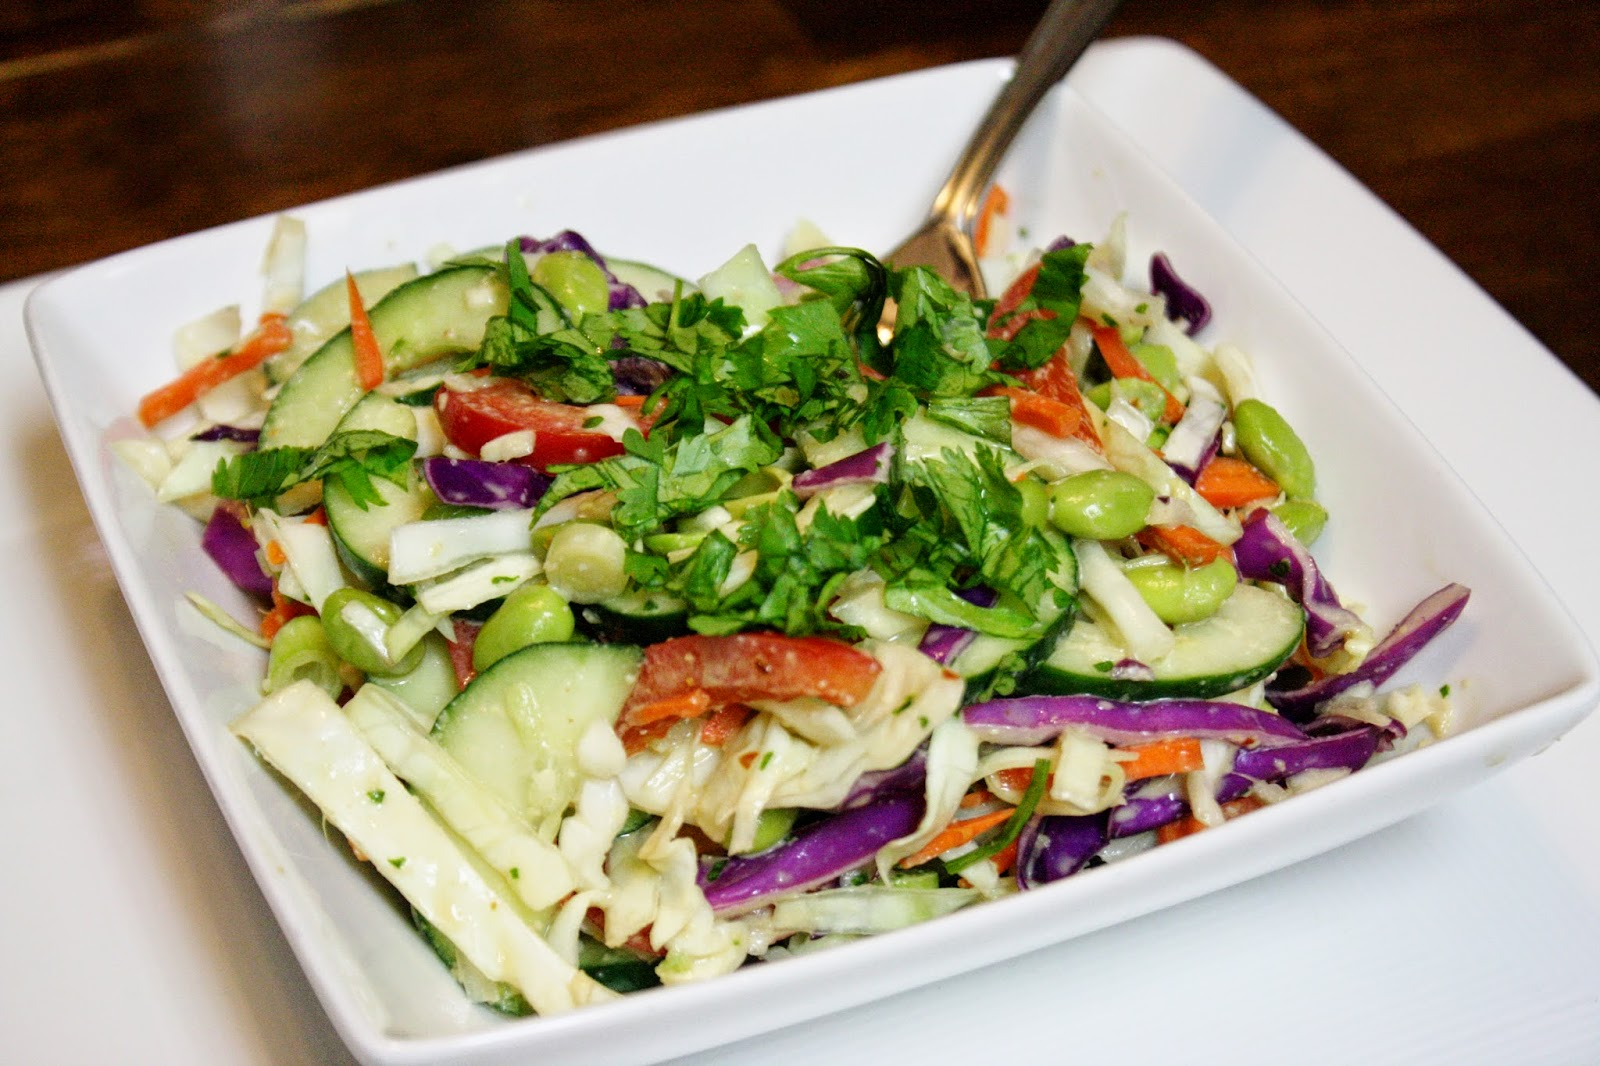 http://eatprayjuice.blogspot.com/2014/09/asian-salad-with-peanut-dressing.html